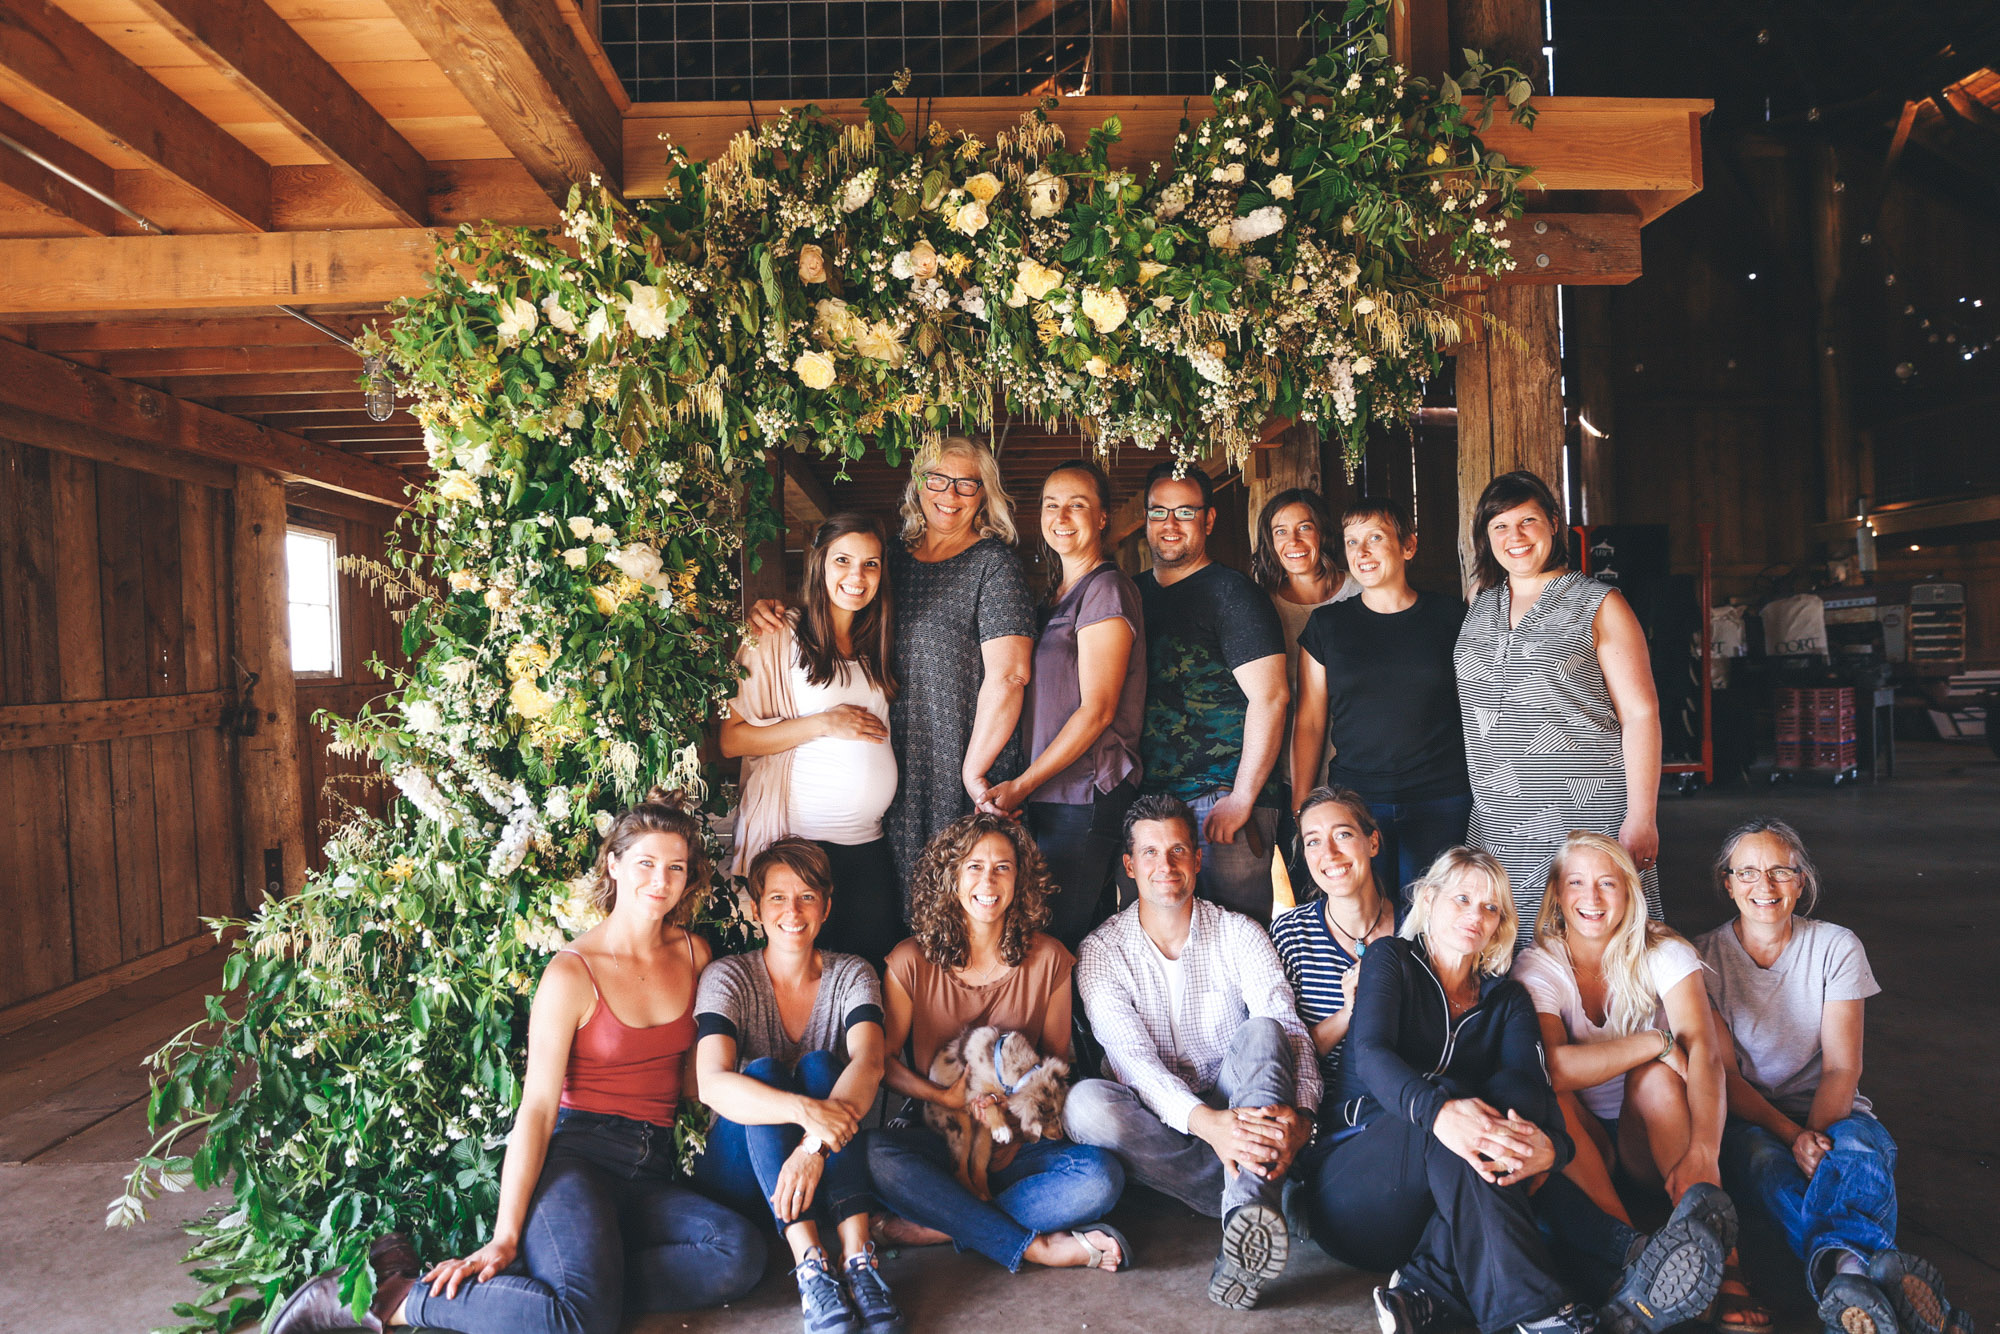 Team Time! - (from left ) Jenn, Nina, Erika, Josh, Becca, Jill, Me, Anne, Brandy, Chris, Erin, Meg, Marlee, Jill <3